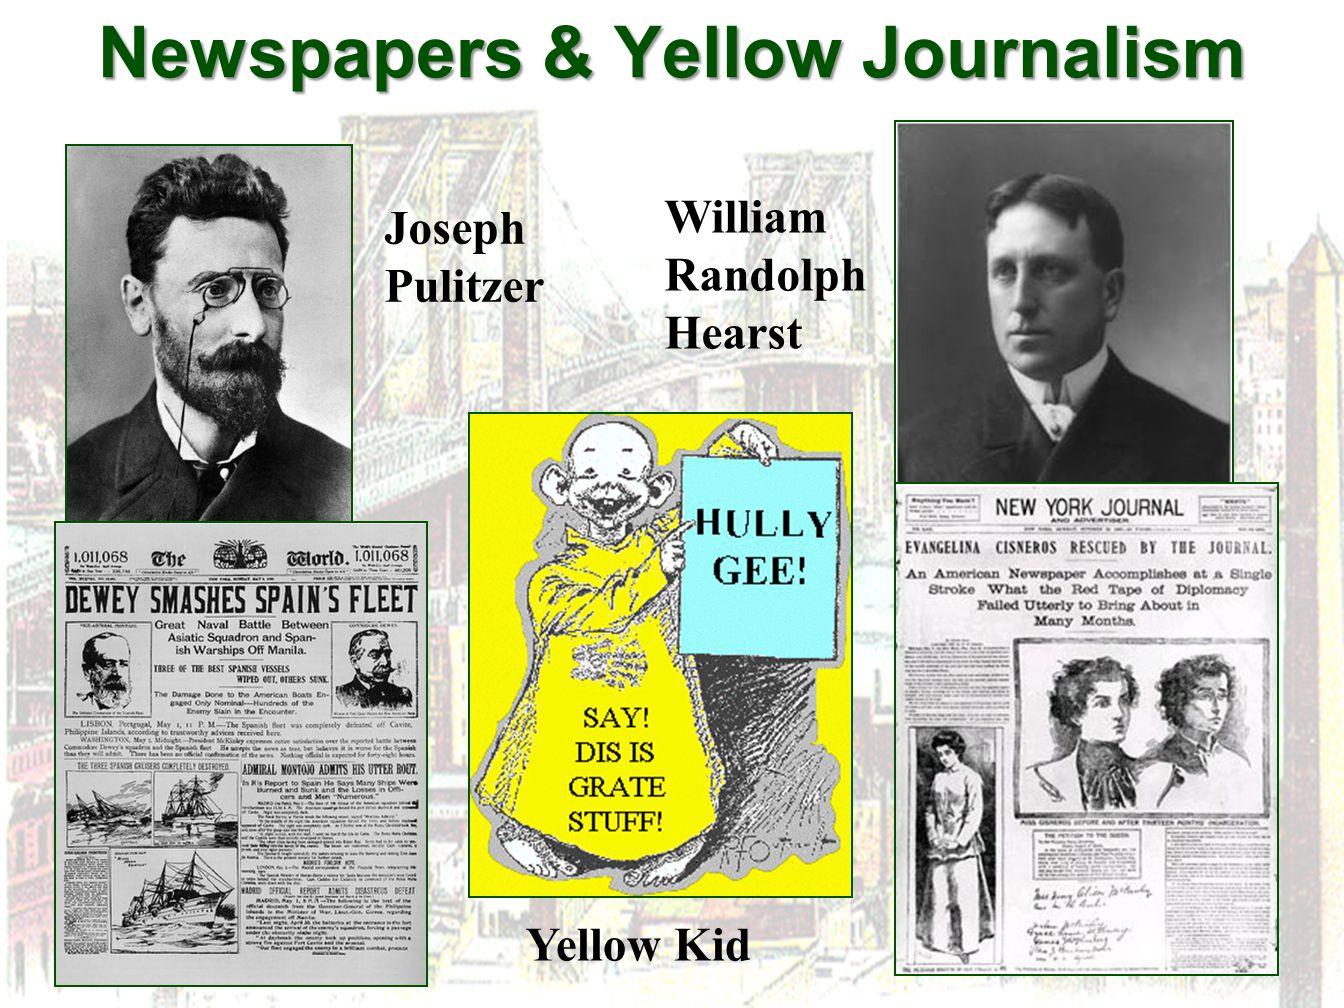 Newspapers & Yellow Journalism